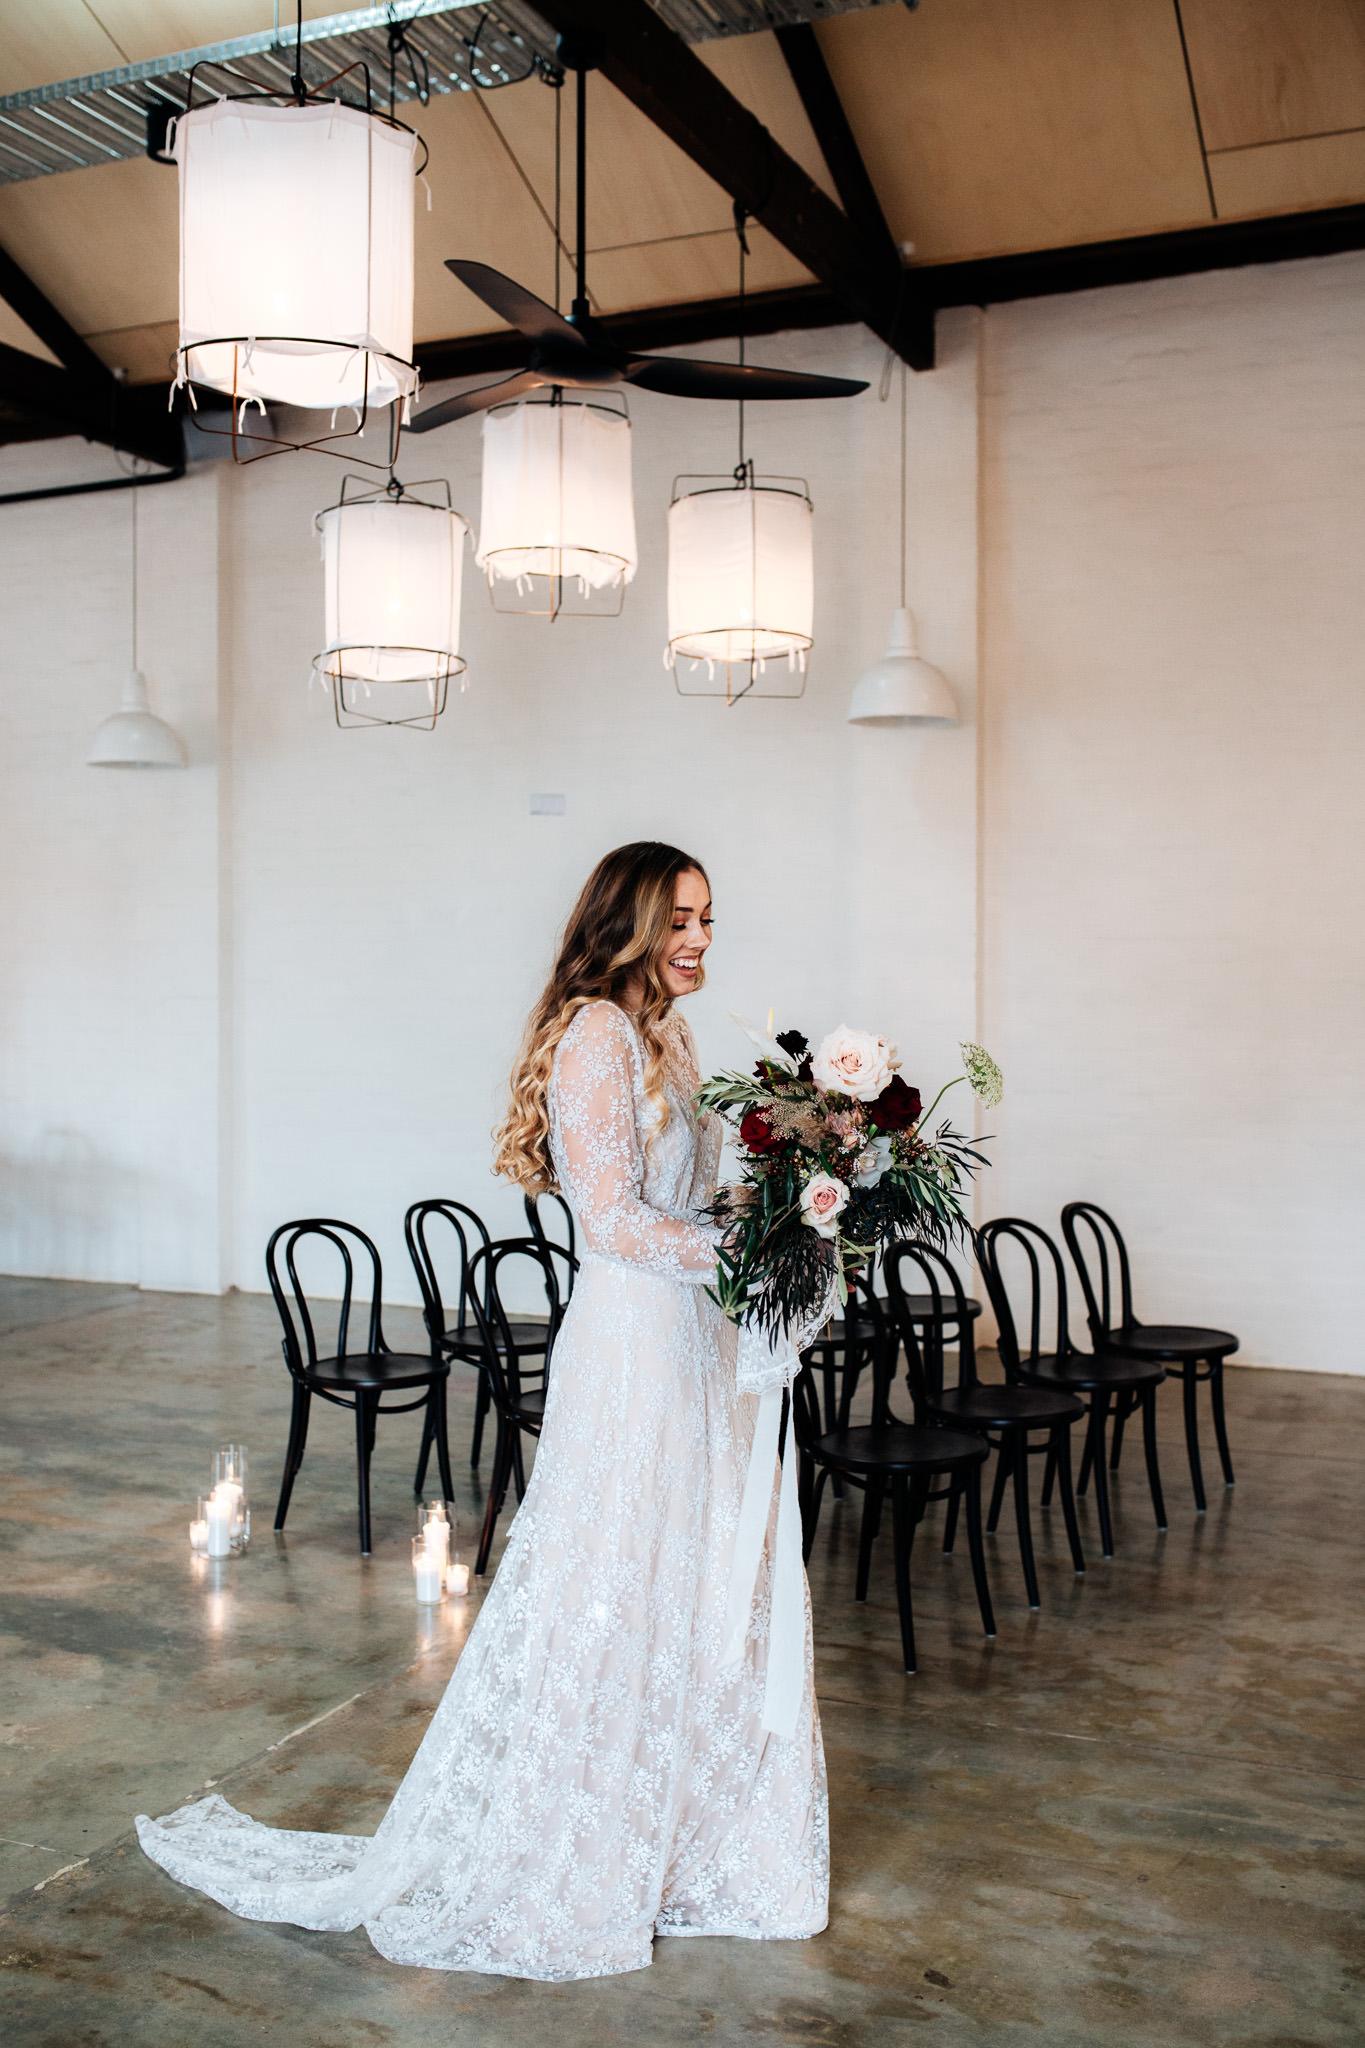 Aster and Rose - Wedding Planner and Co-ordinator - Torquay, Geelong, Surfcoast - Summer Wedding-78.jpg